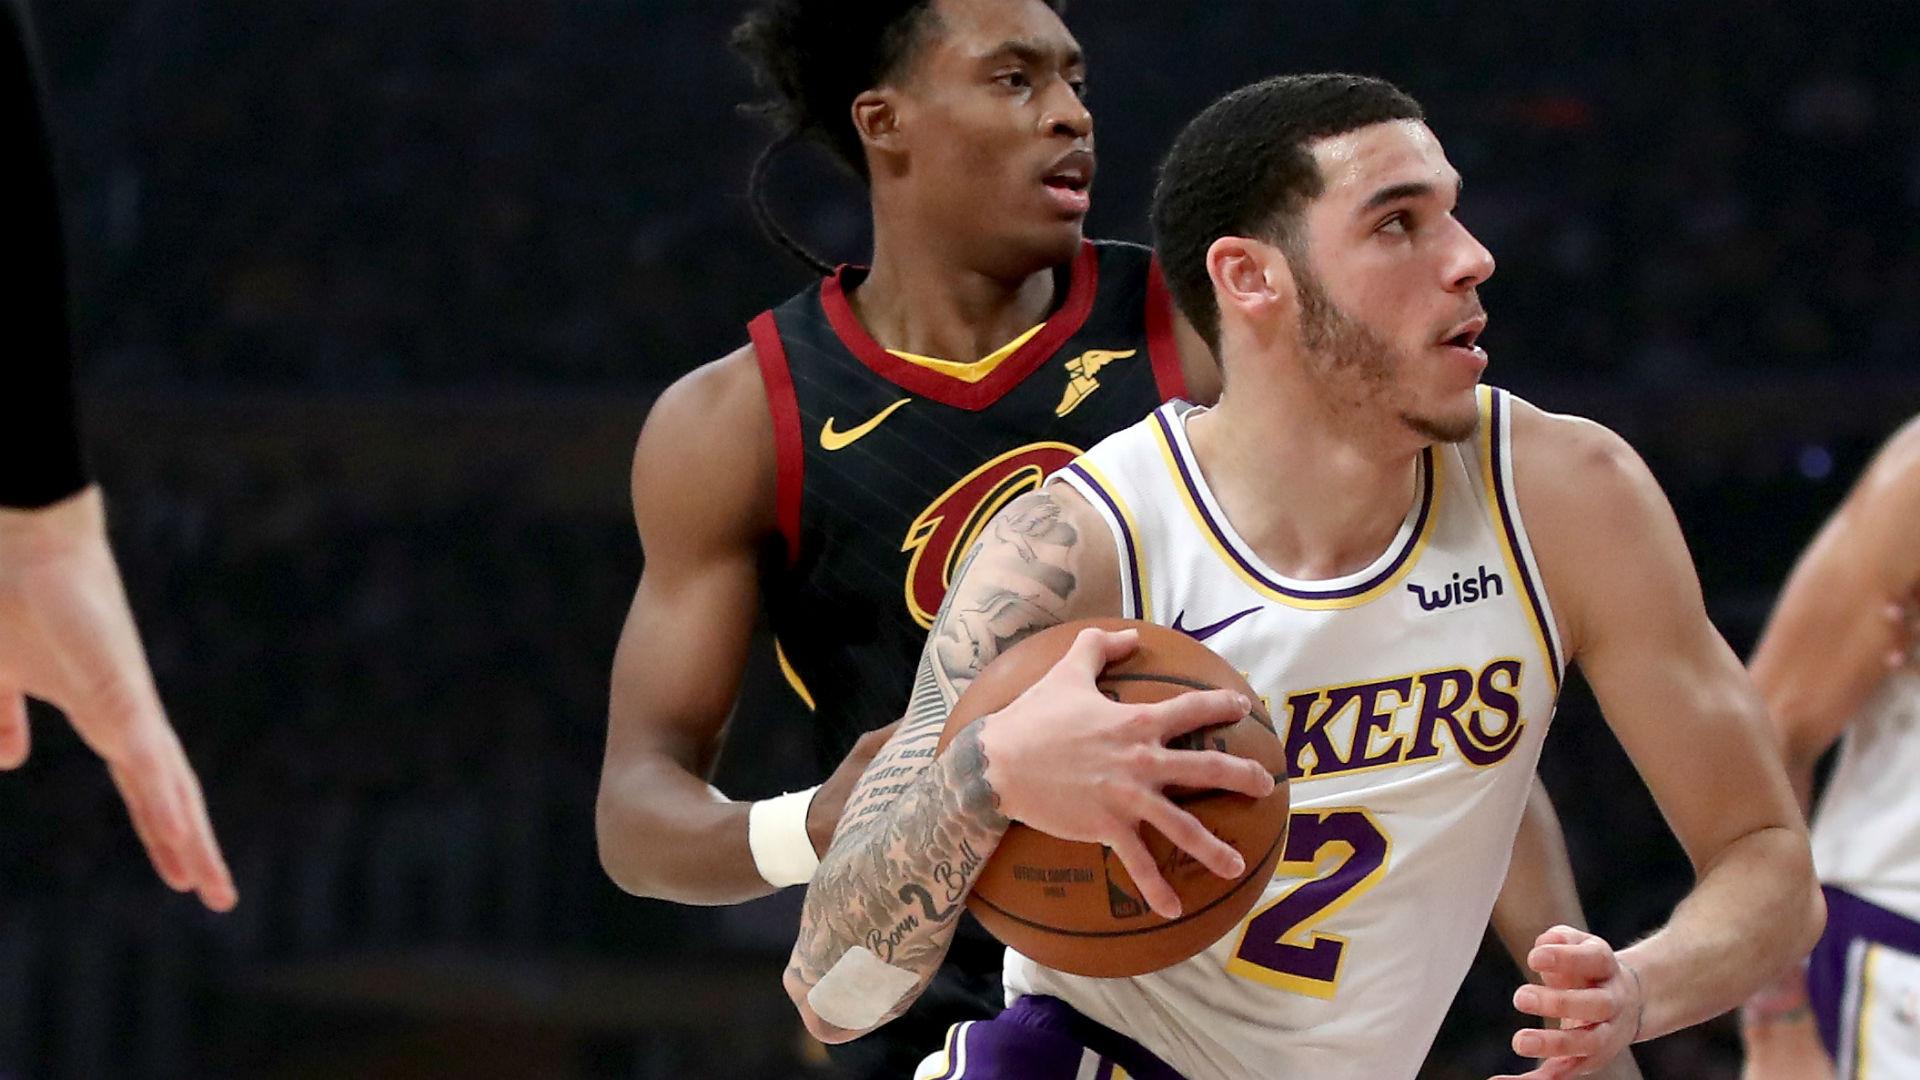 Bulls Fall 107-100 To Lakers